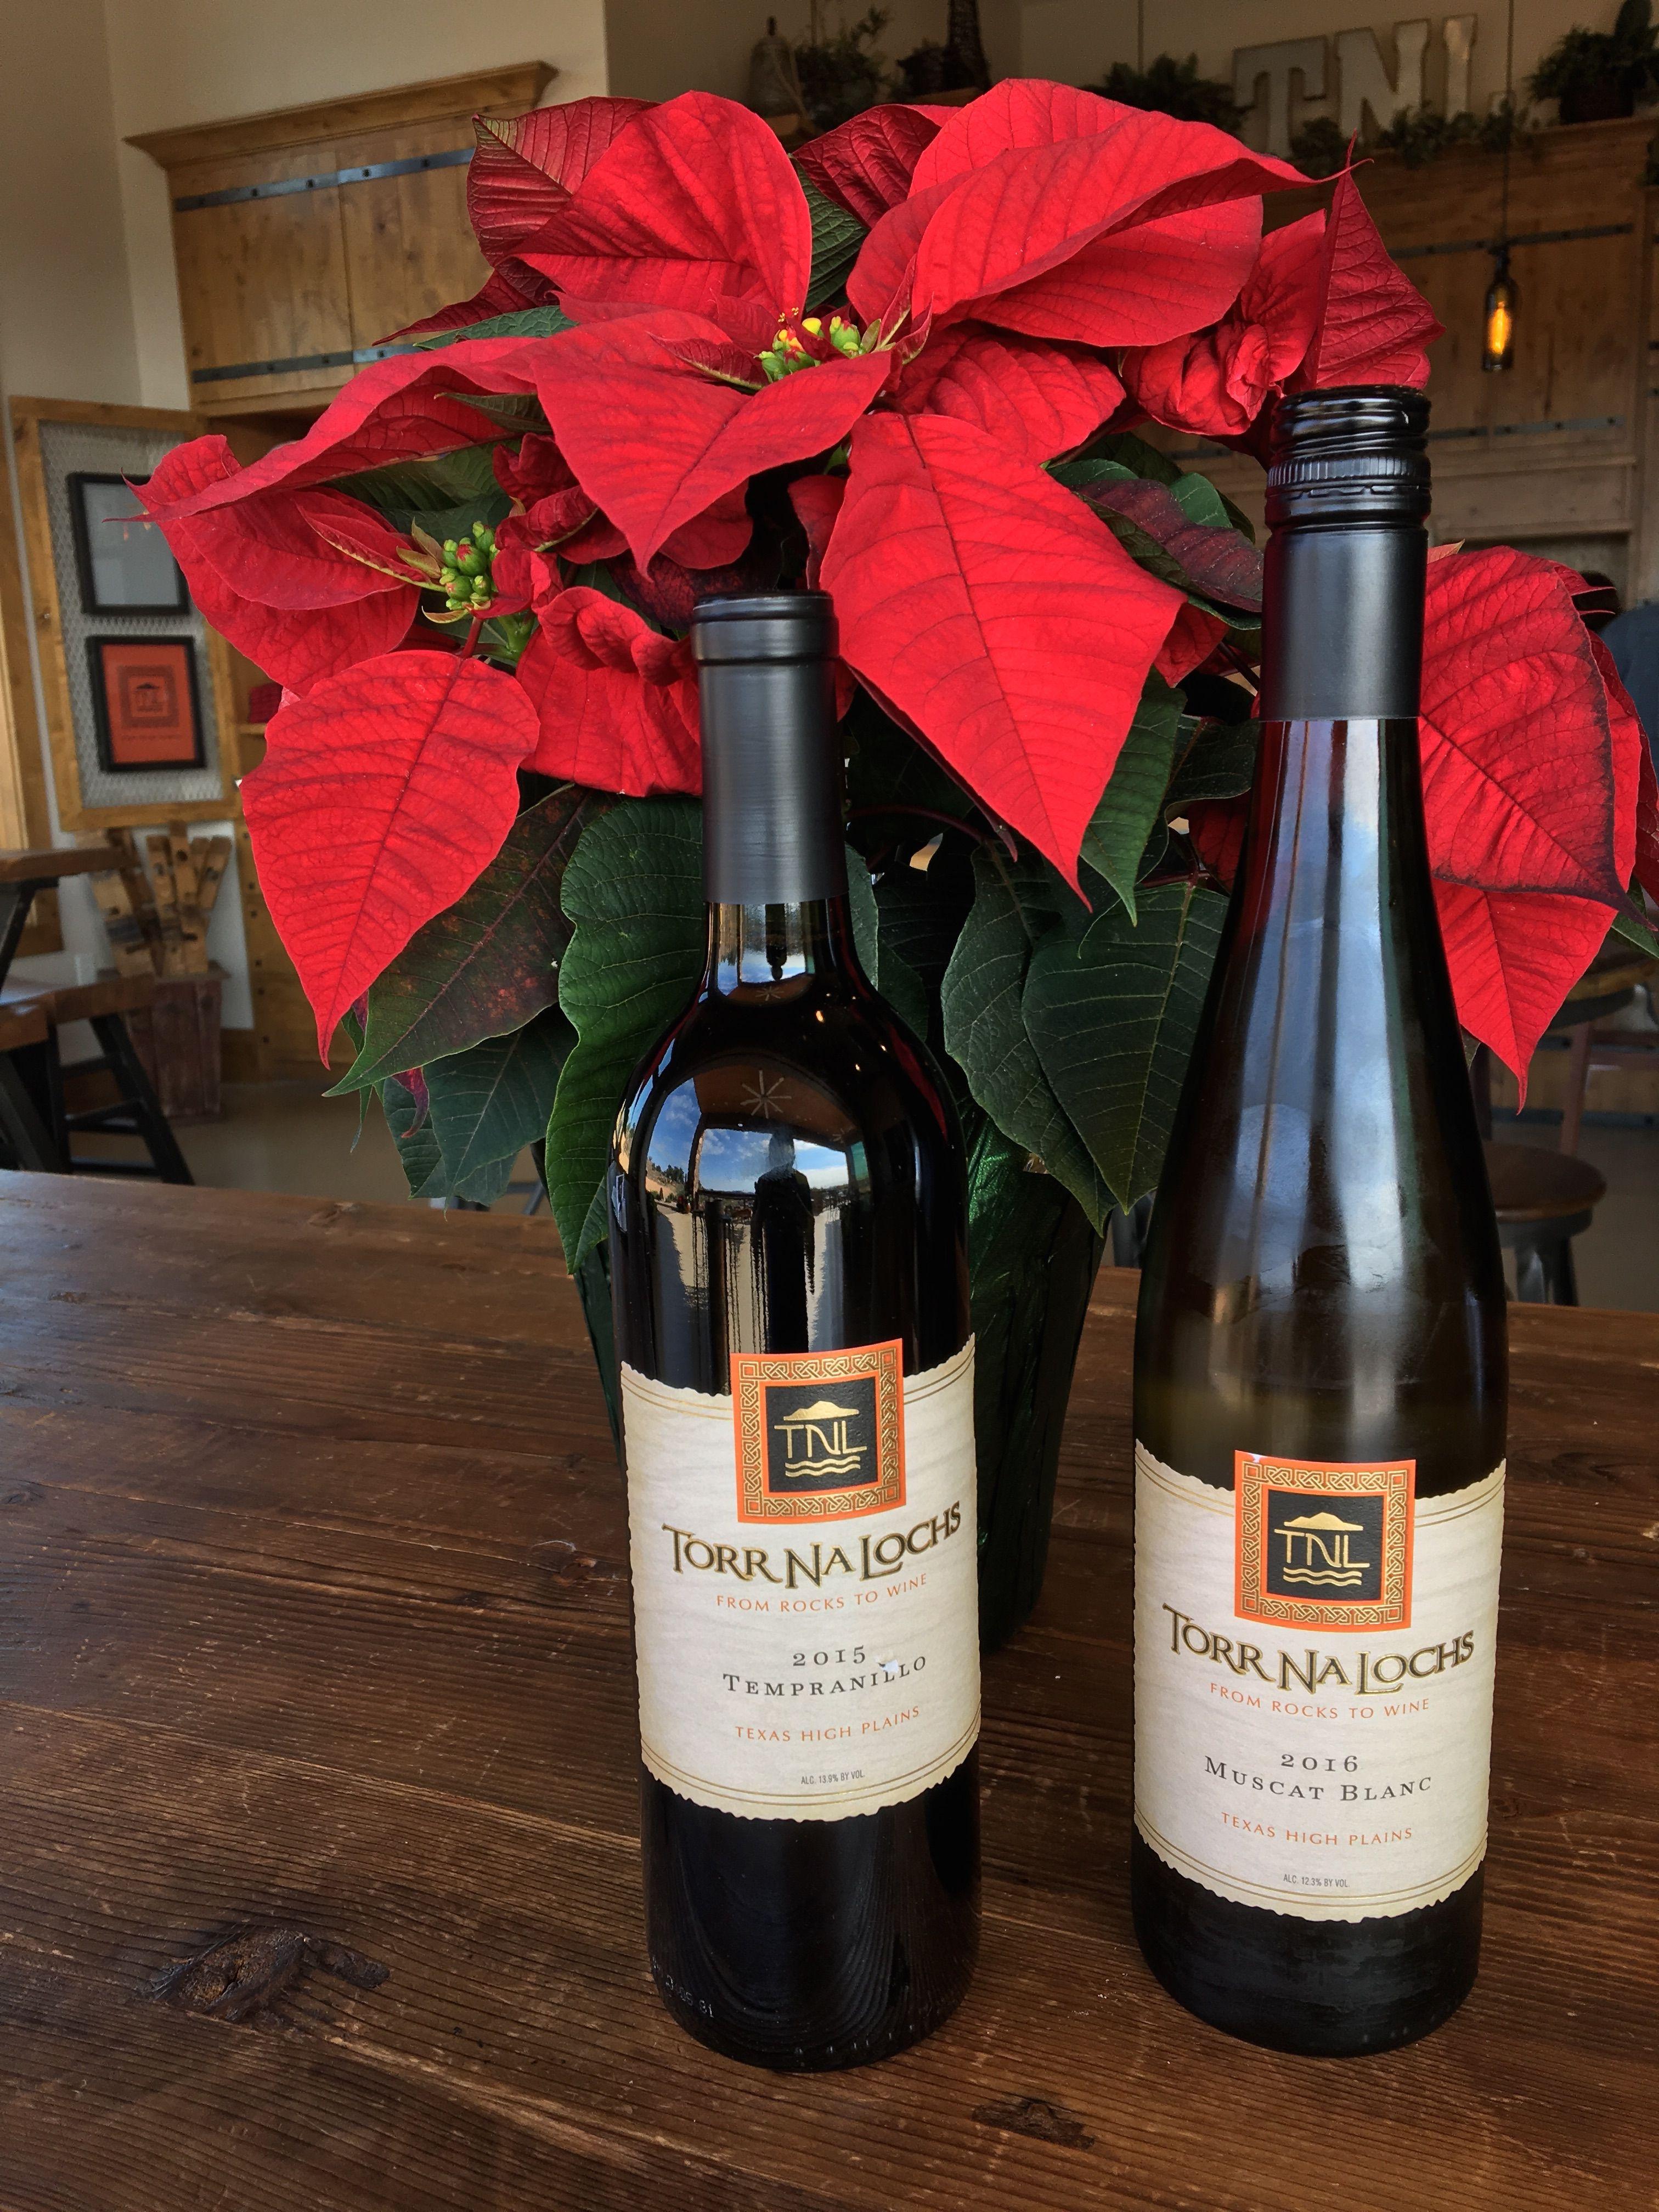 Christmastime Wine Wine Bottle Wine Bottle